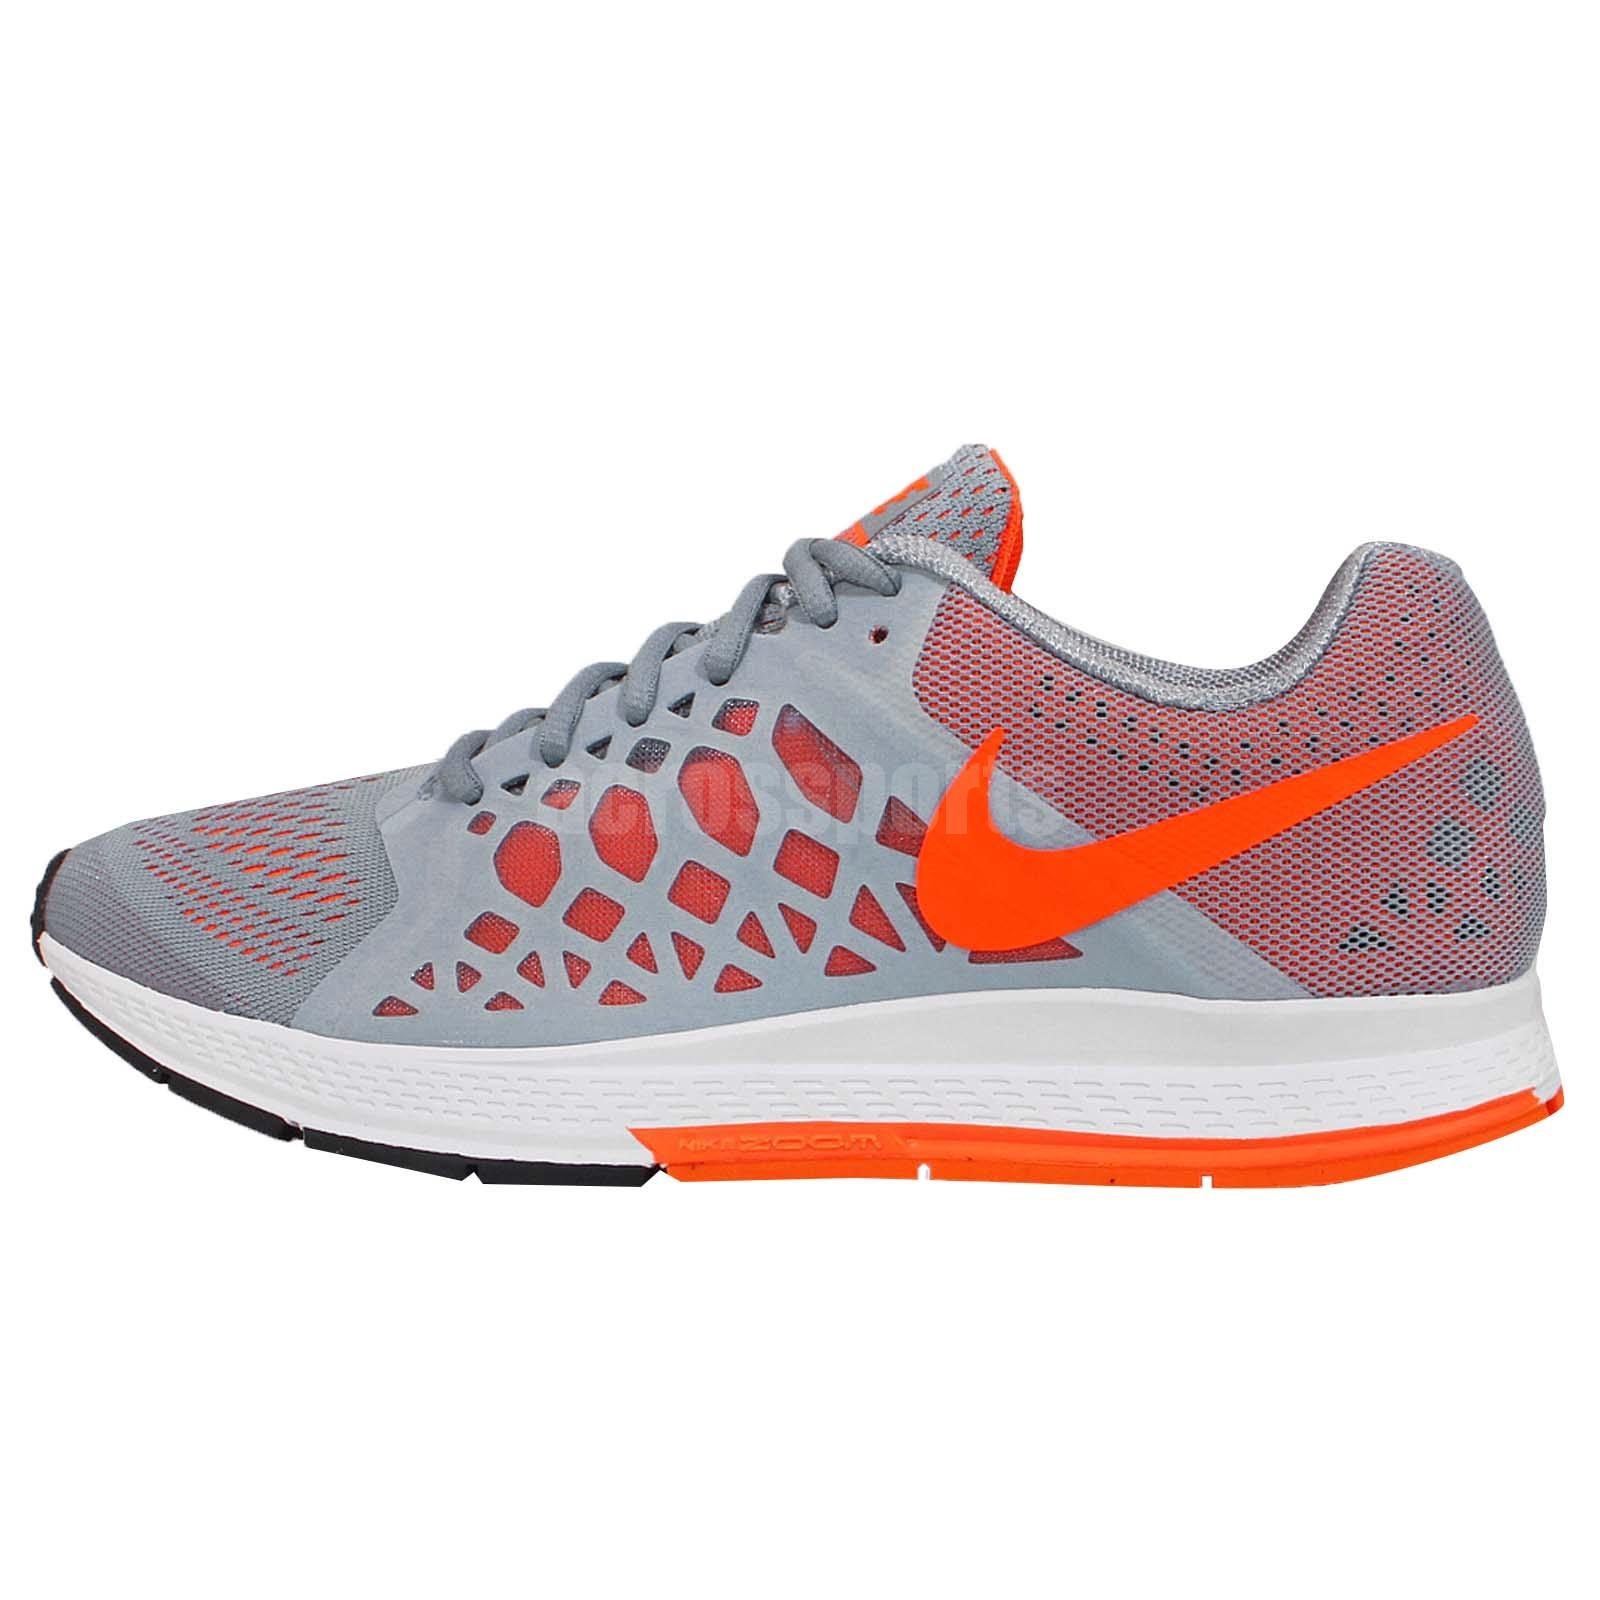 nike air zoom pegasus 31 mens cushion runner sneakers running shoes 652925 008 ebay. Black Bedroom Furniture Sets. Home Design Ideas